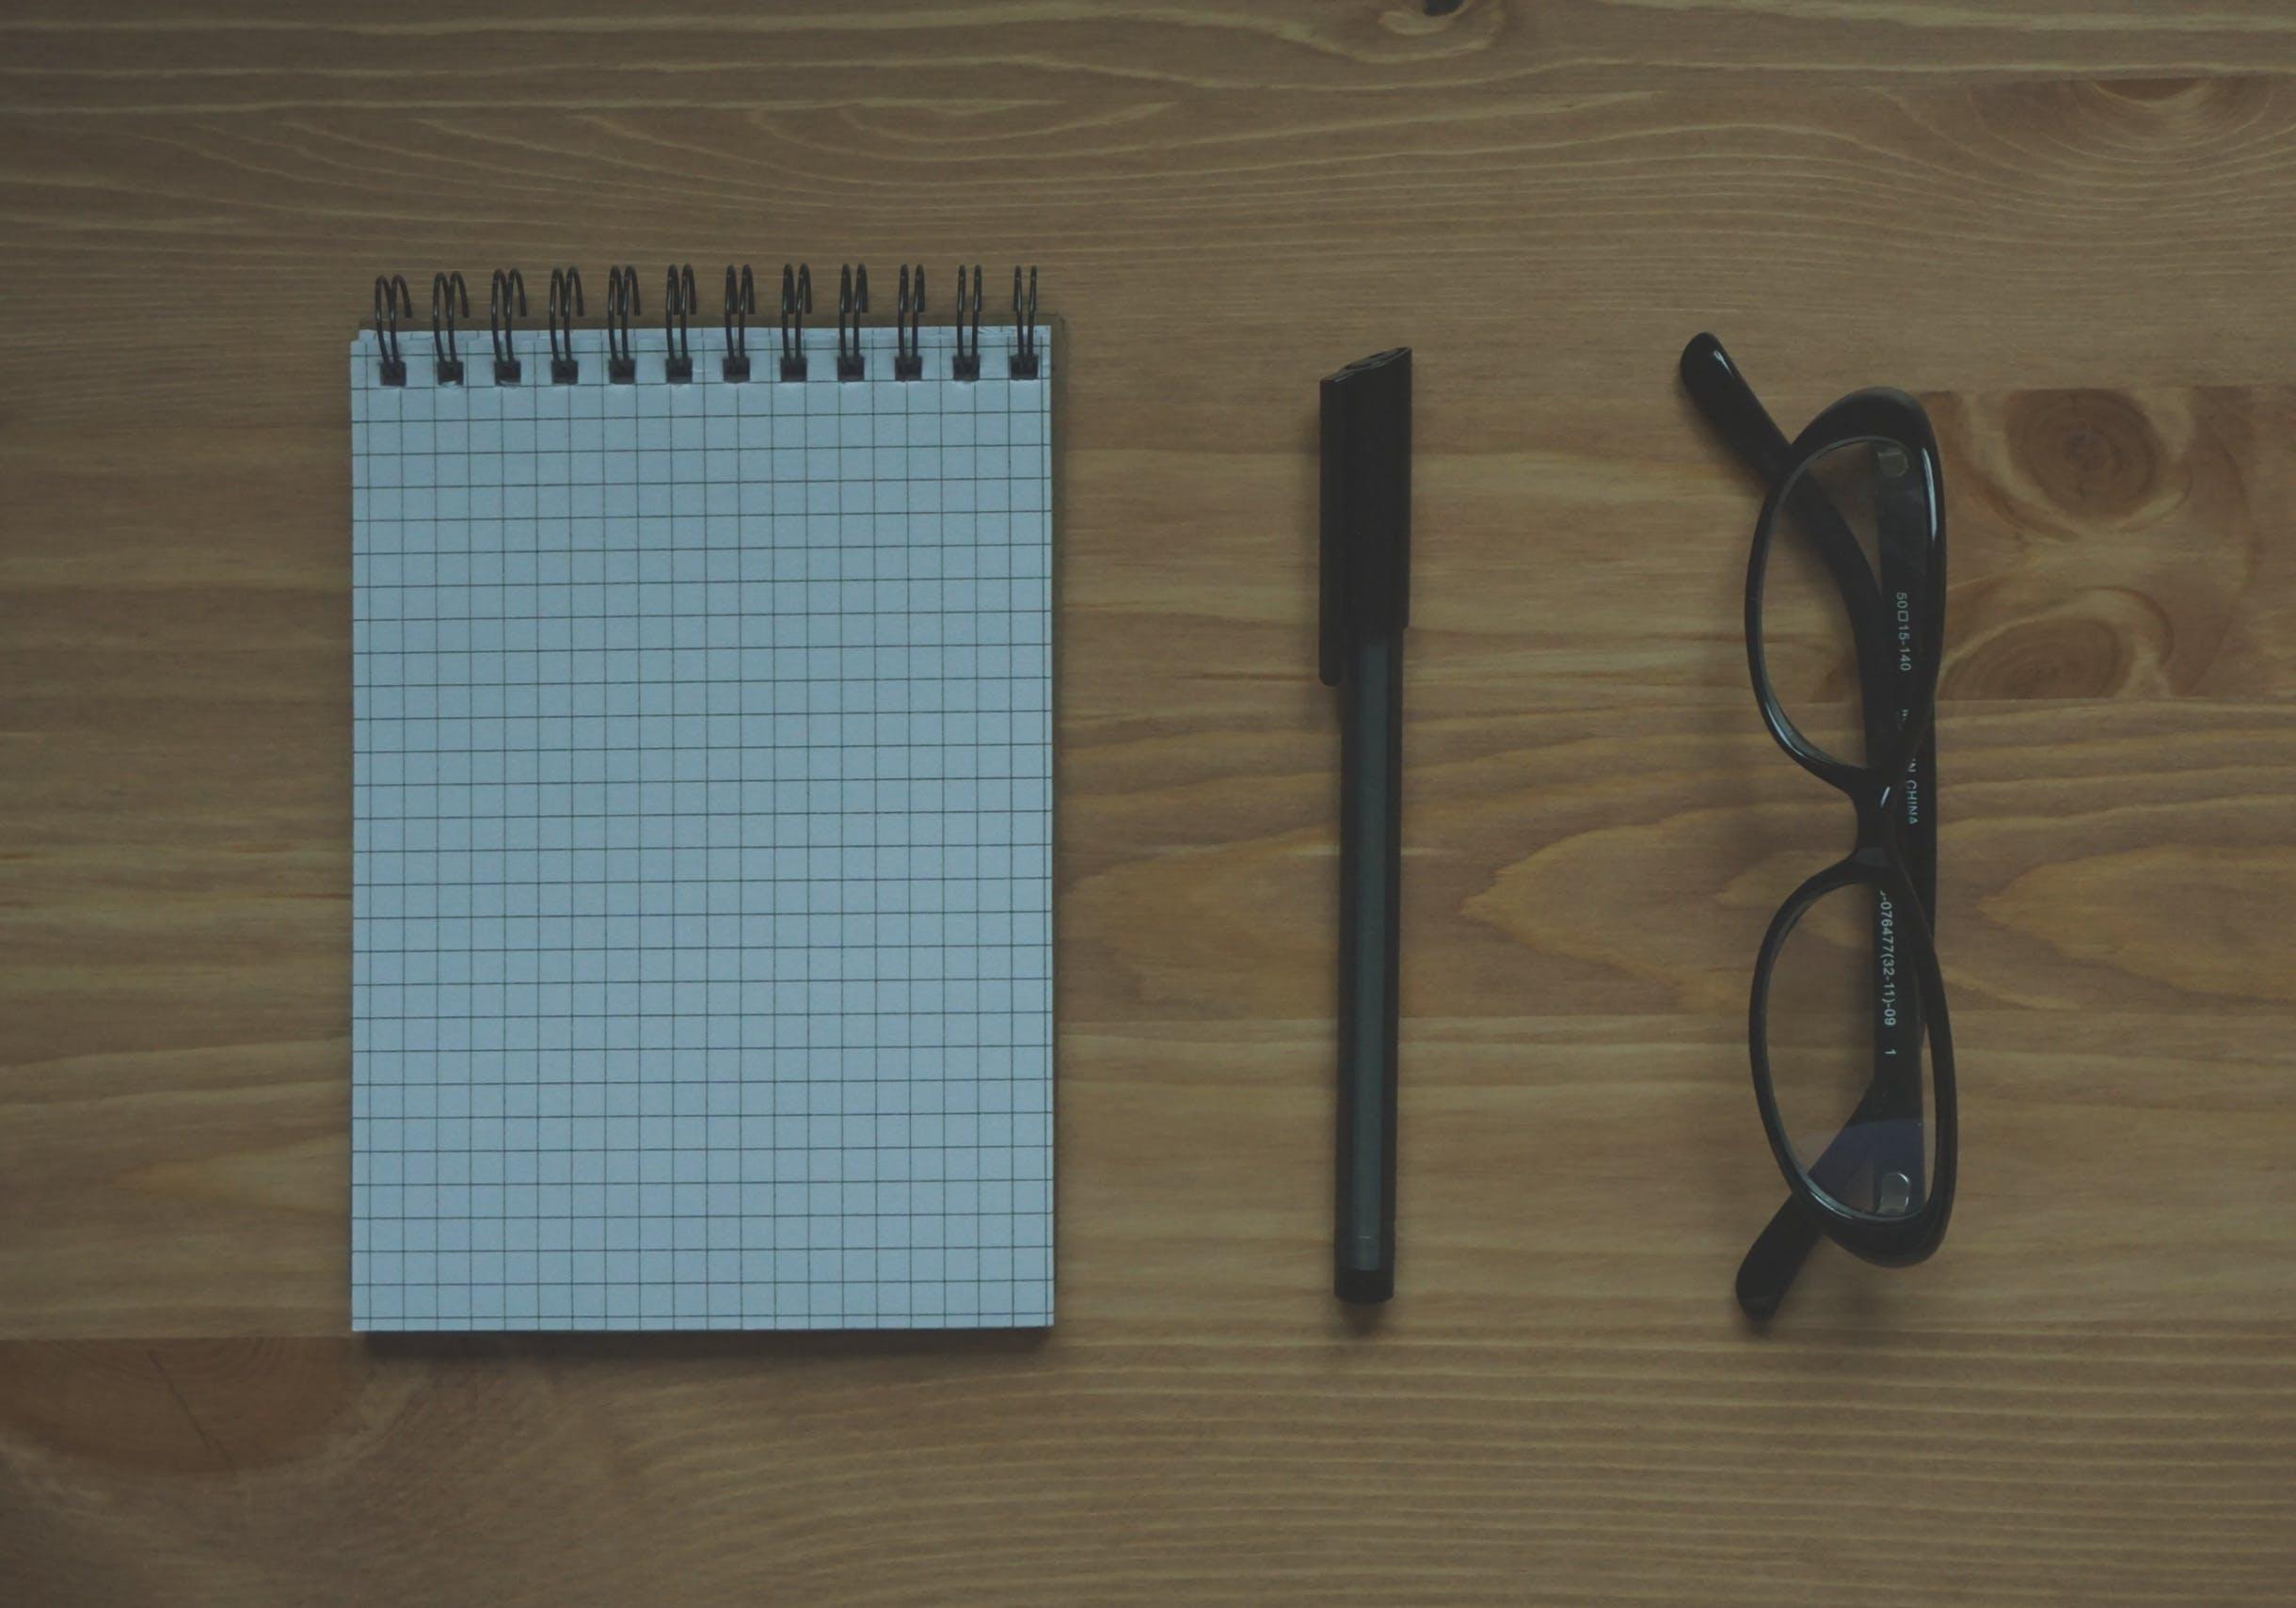 Black Framed Eyeglasses Near Graphing Paper Spiral Notebook